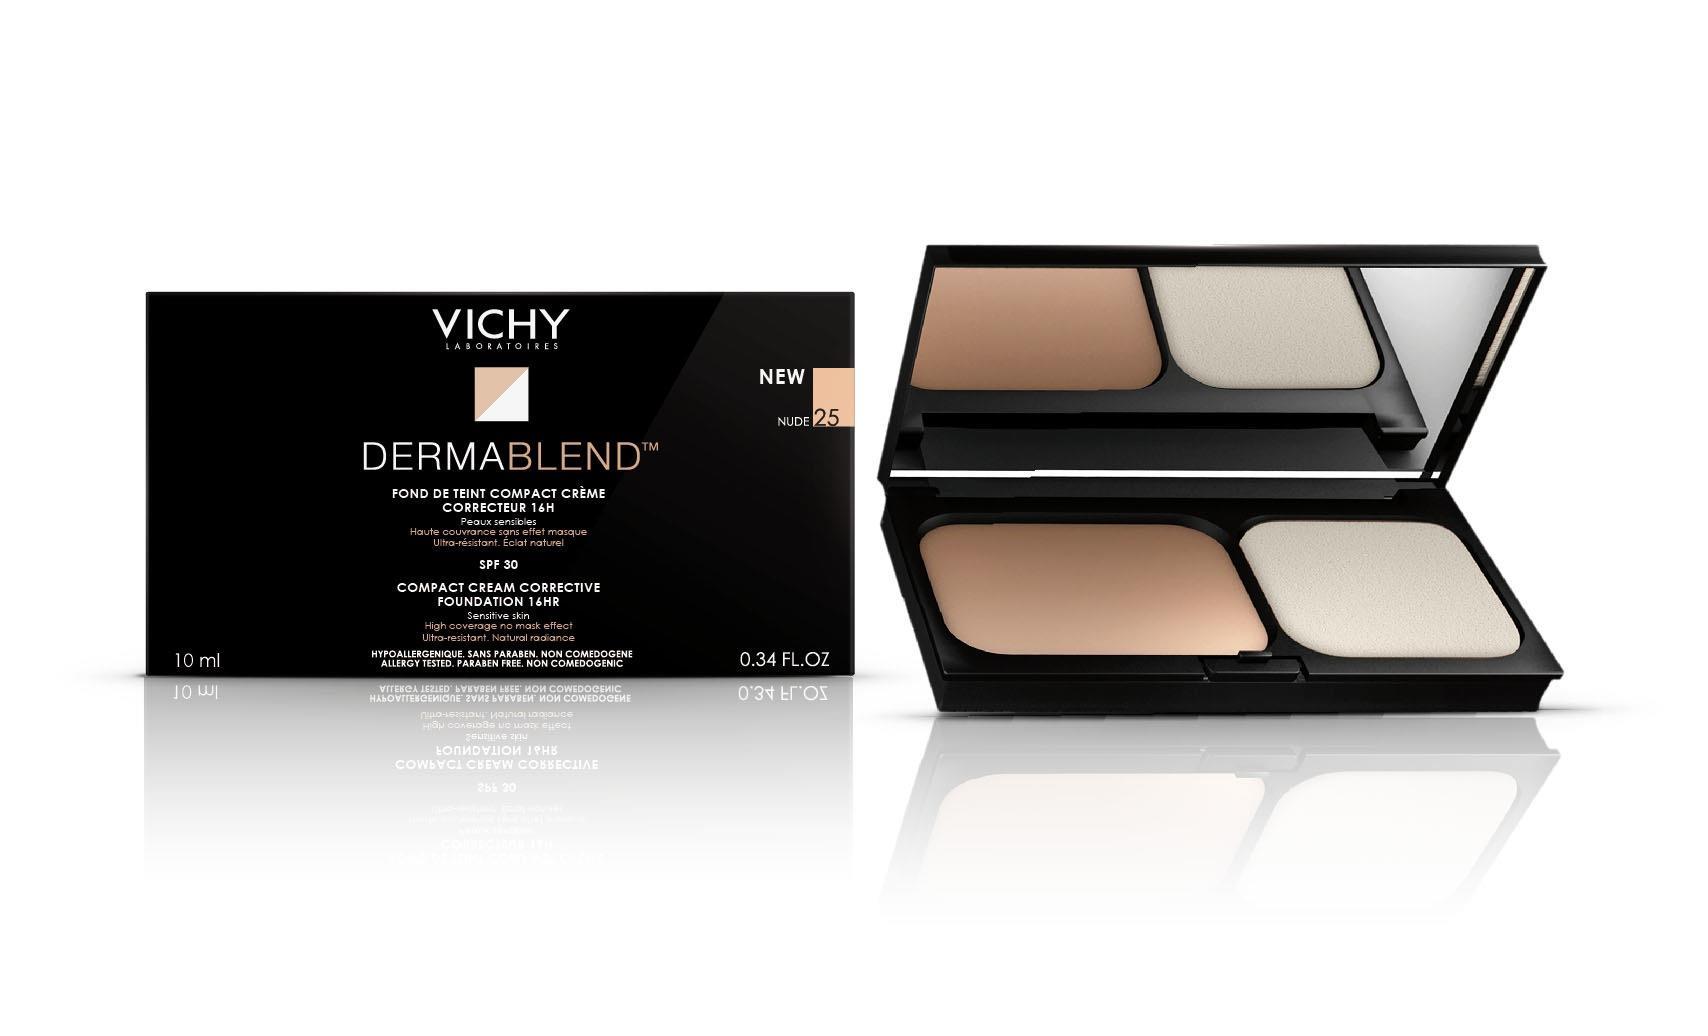 VICHY Dermablend Kompaktcreme Make-up